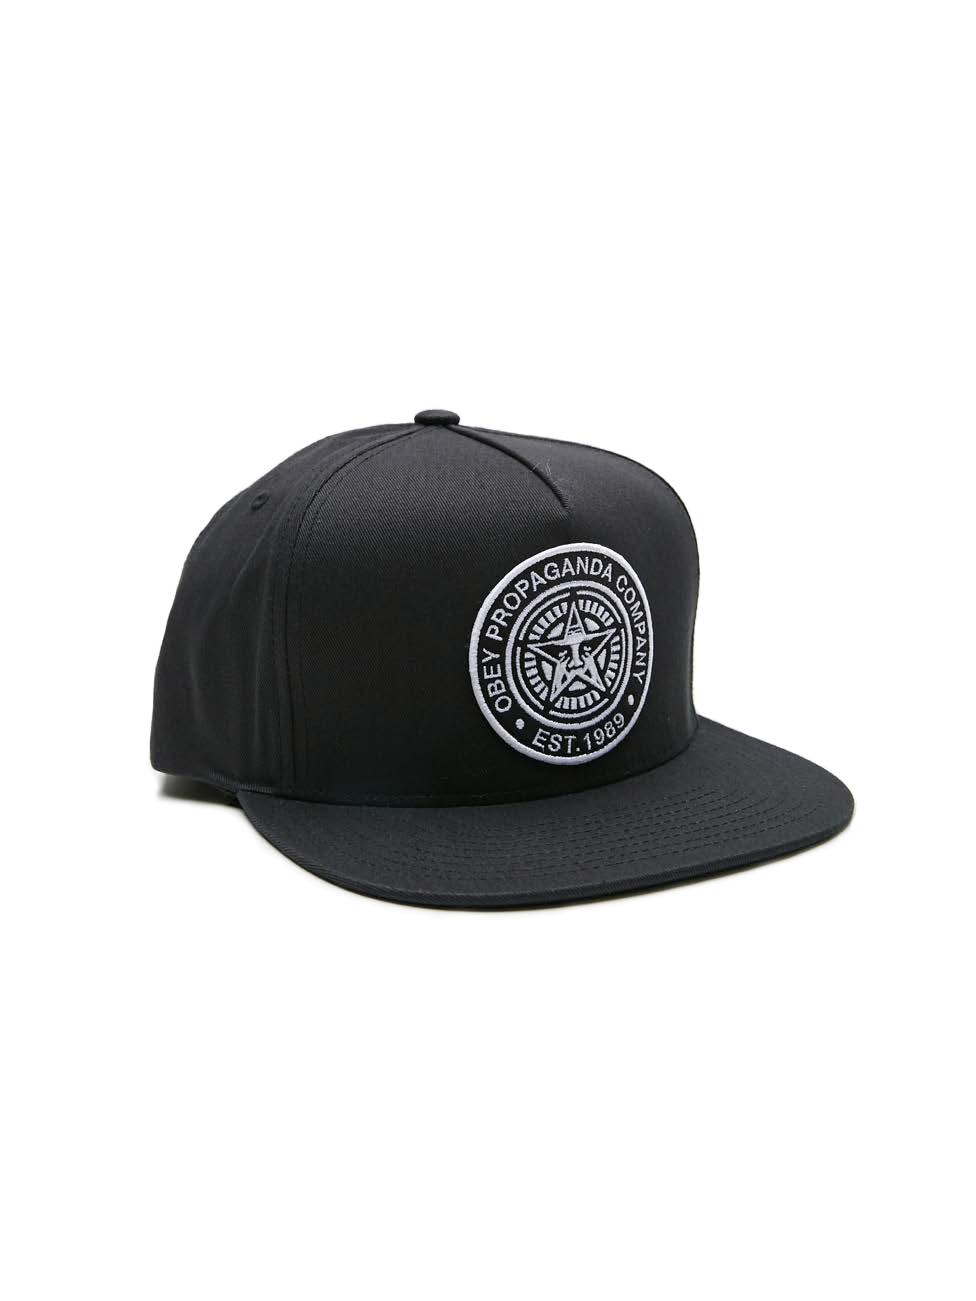 33e6a01f65deb3 Established 89 II Trucker Snapback Hat - Obey Clothing UK